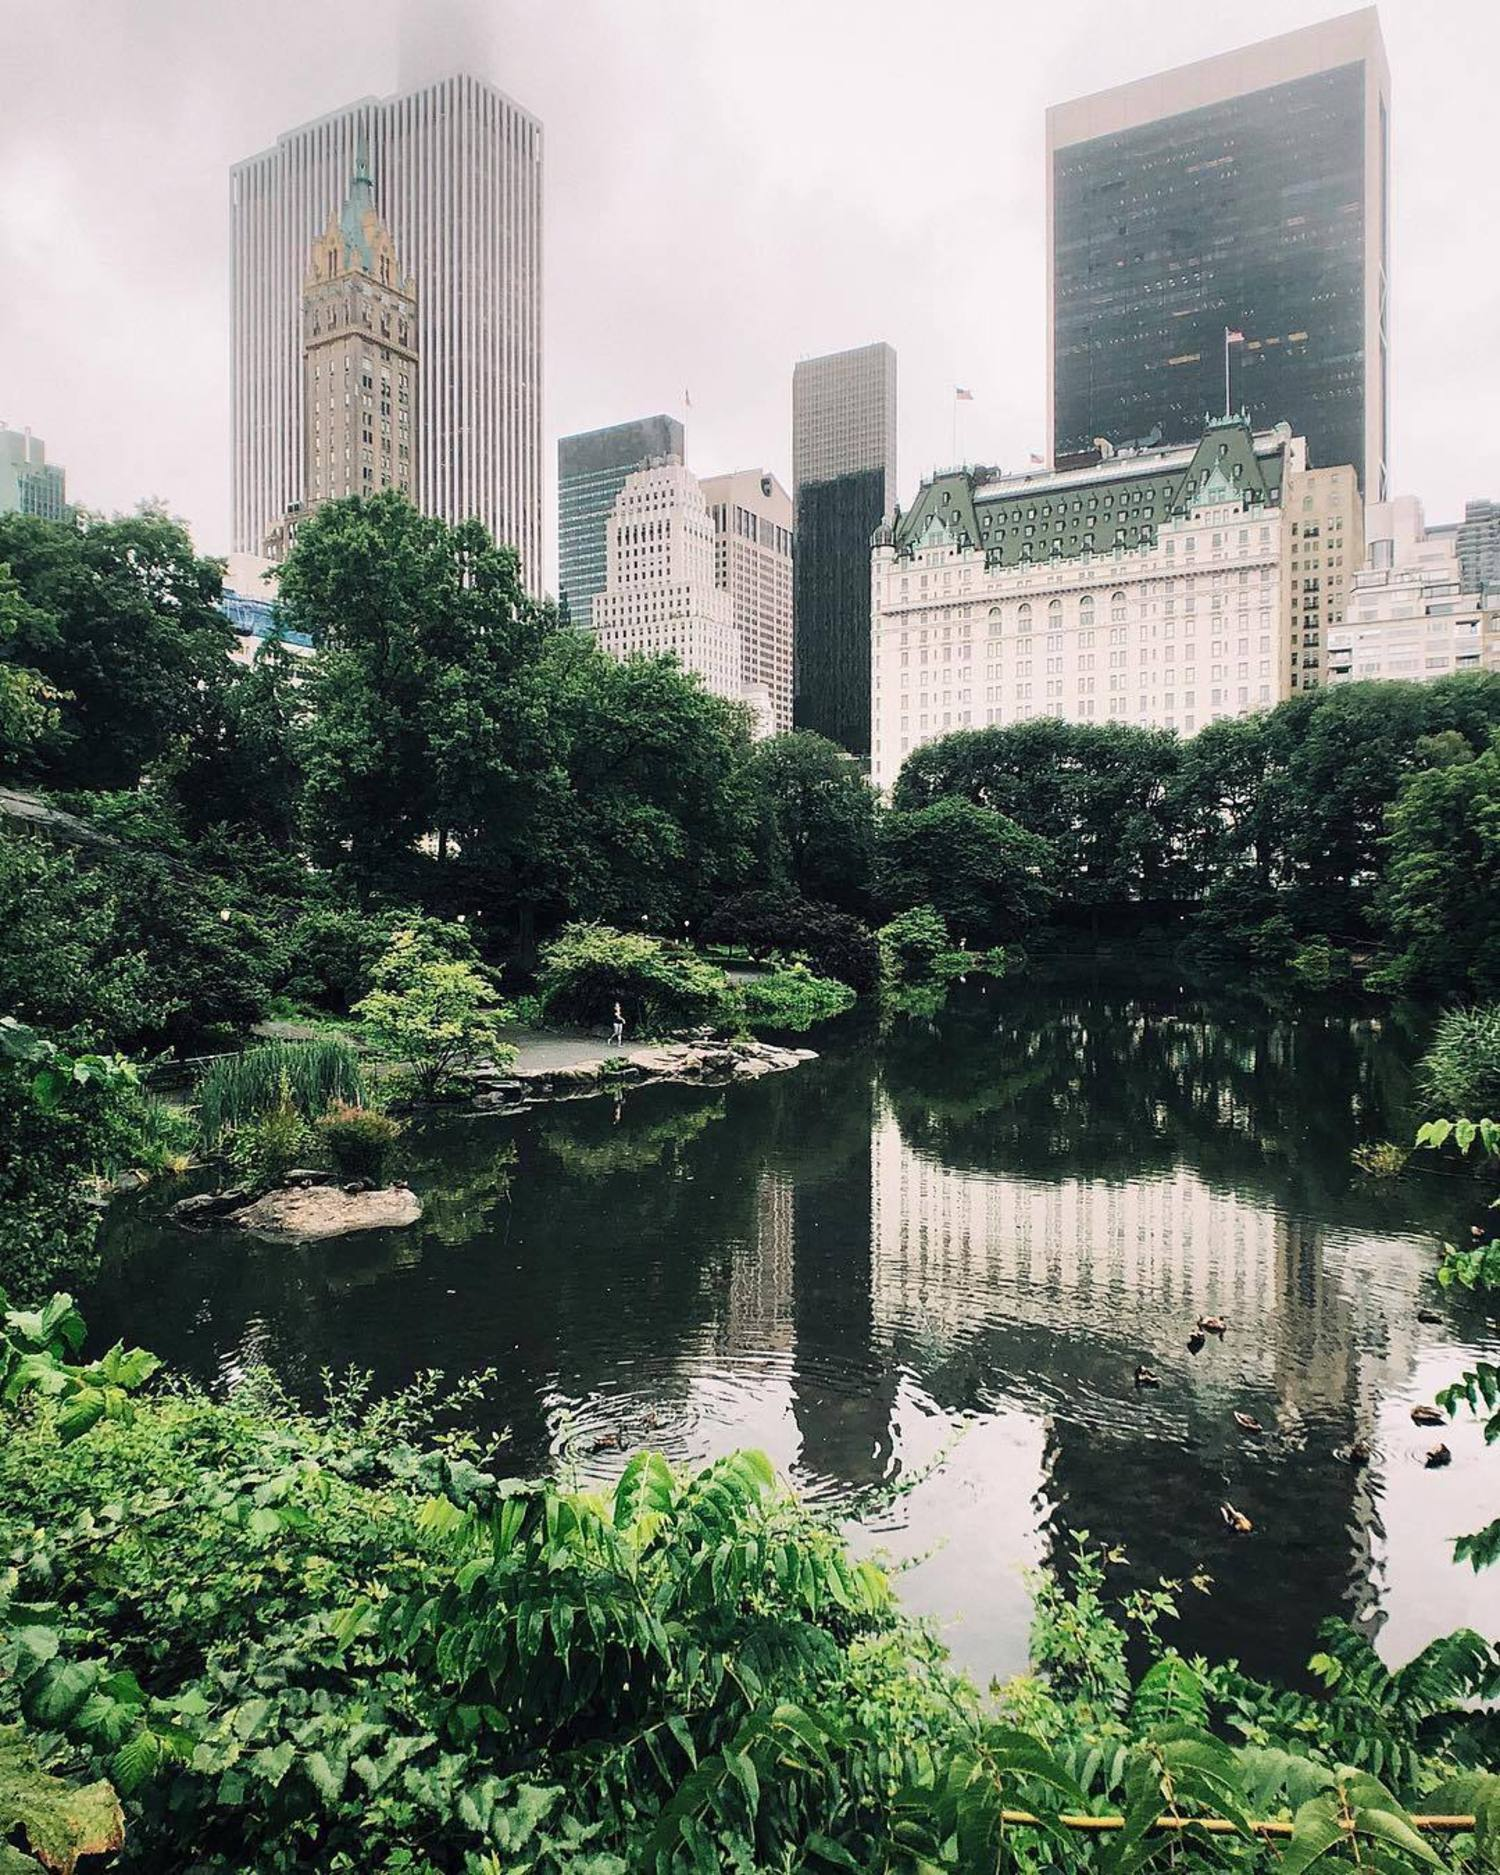 Central Park, New York. Photo via @melliekr #viewingnyc #newyork #newyorkcity #nyc #centralpark #rain